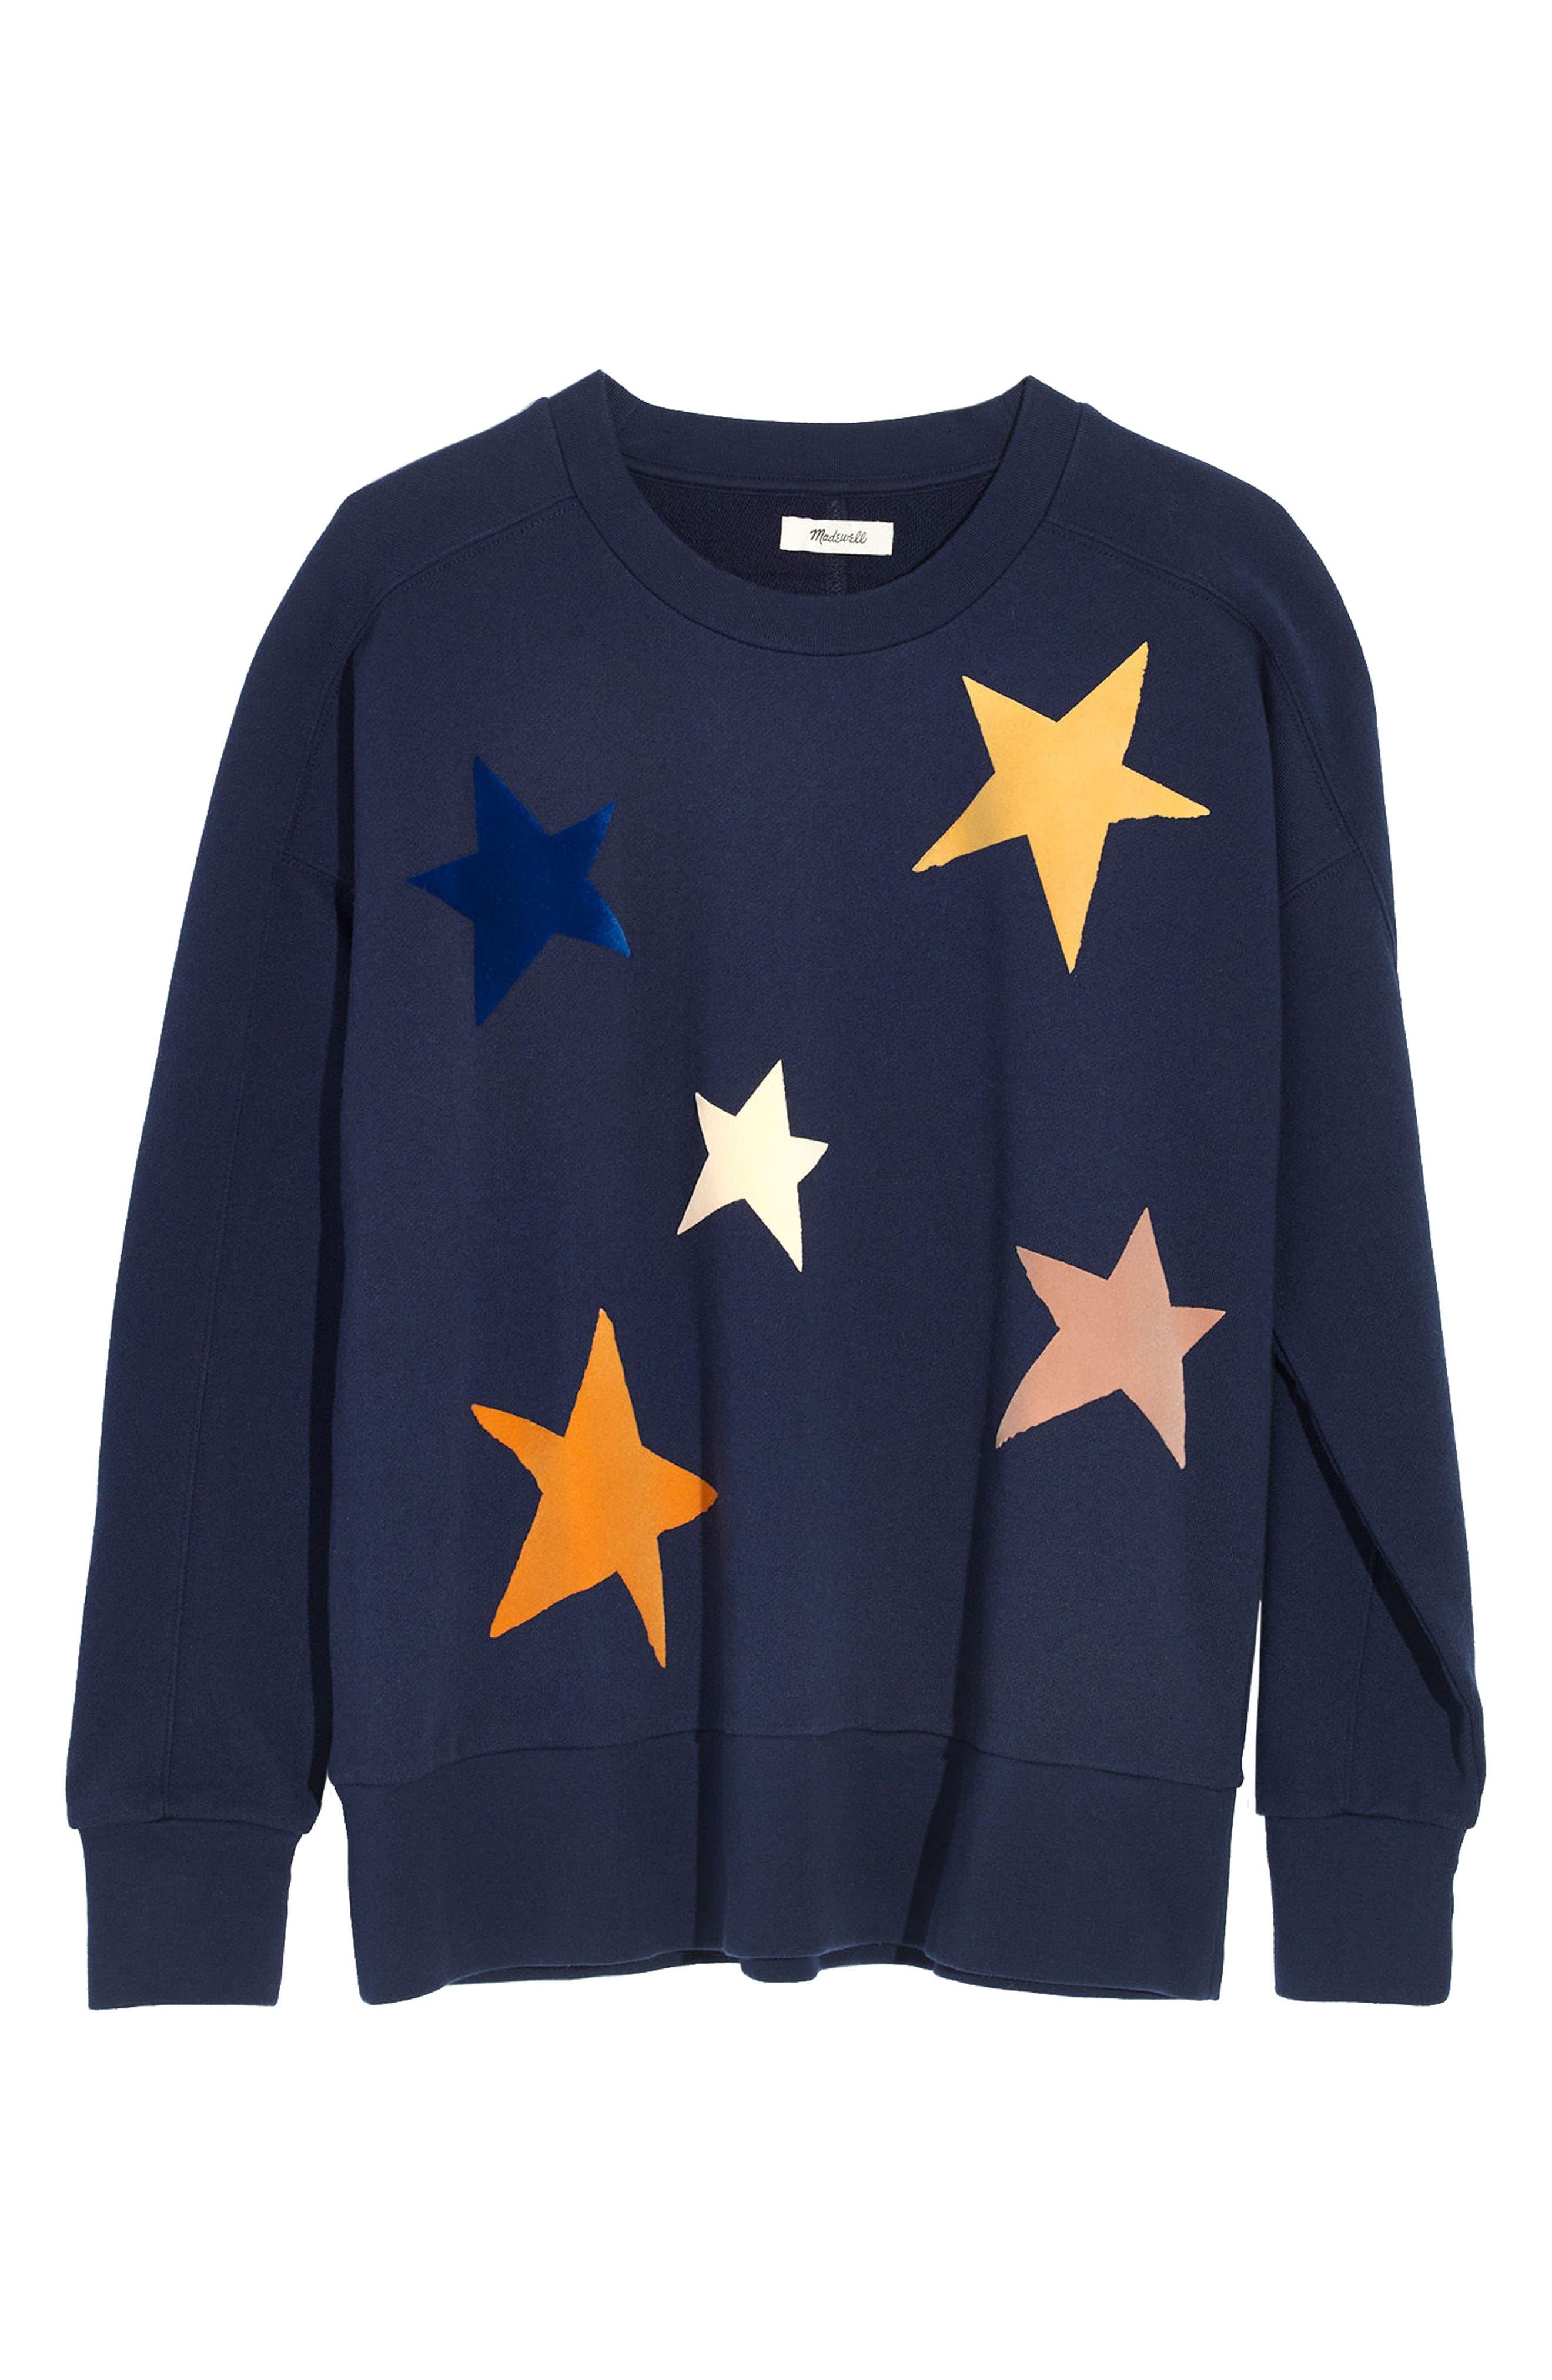 Starry Sweatshirt,                             Alternate thumbnail 3, color,                             410